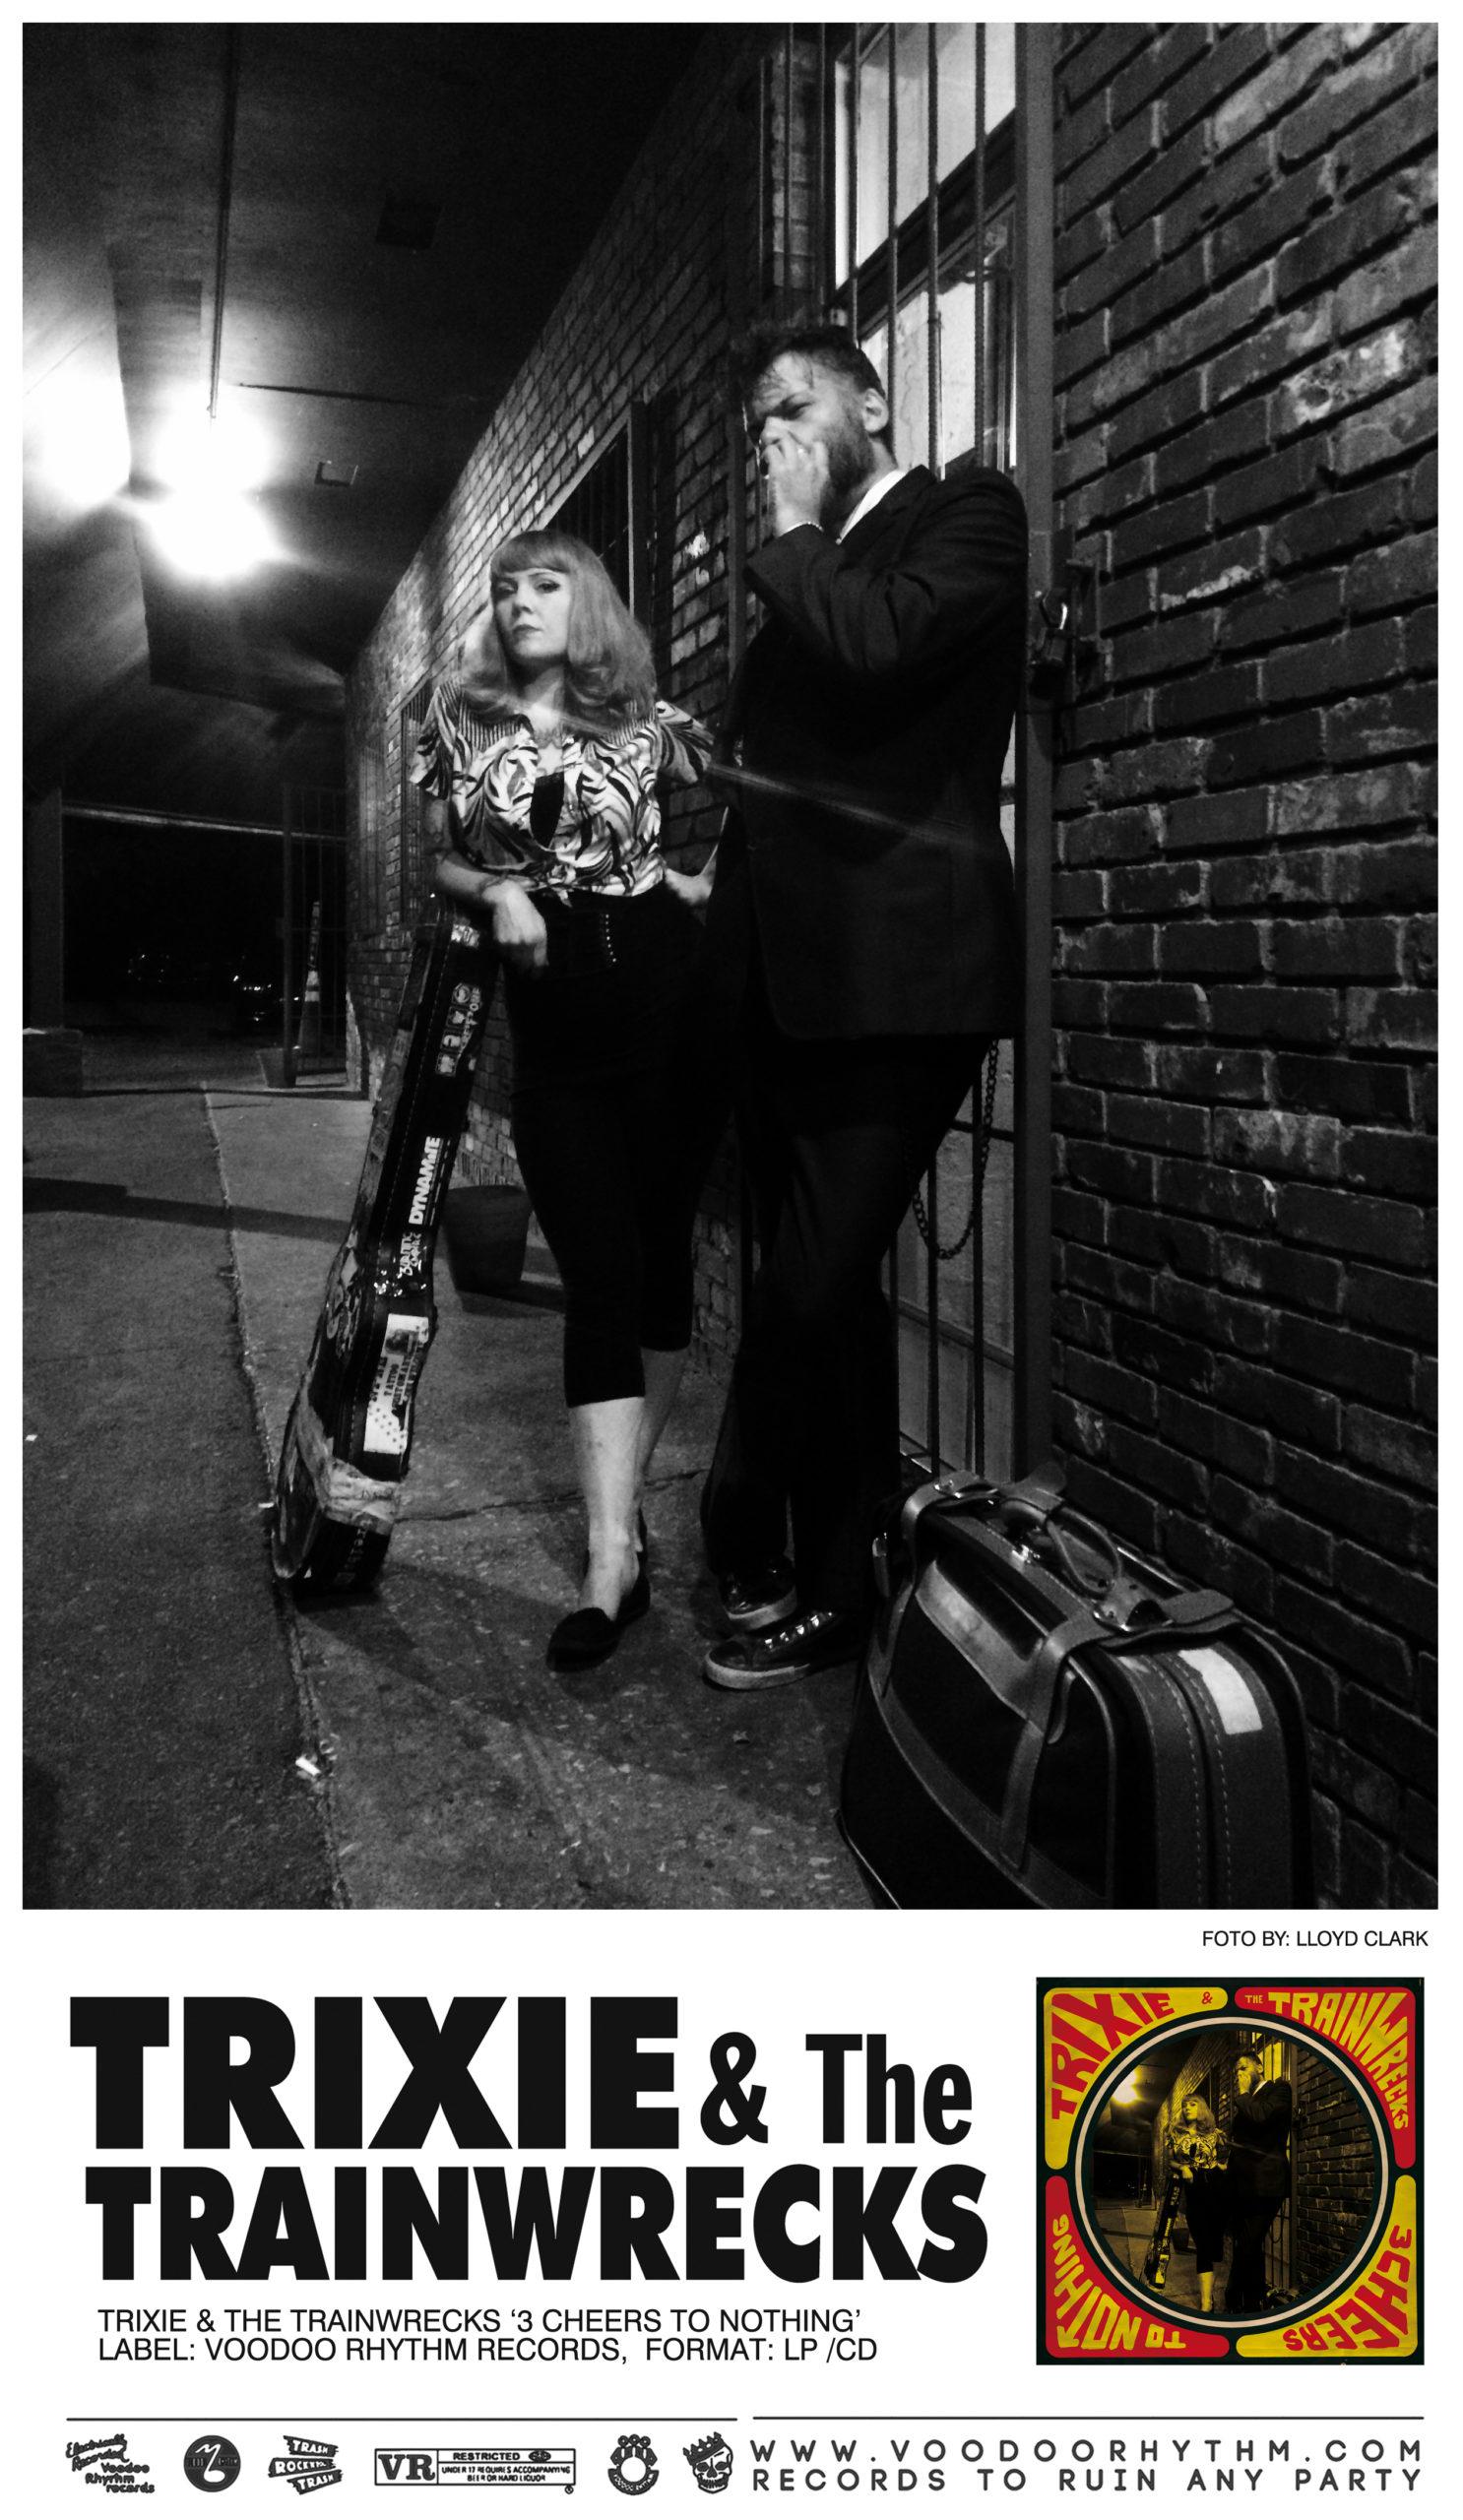 Trixie & The Trainwrecks (US/UK)